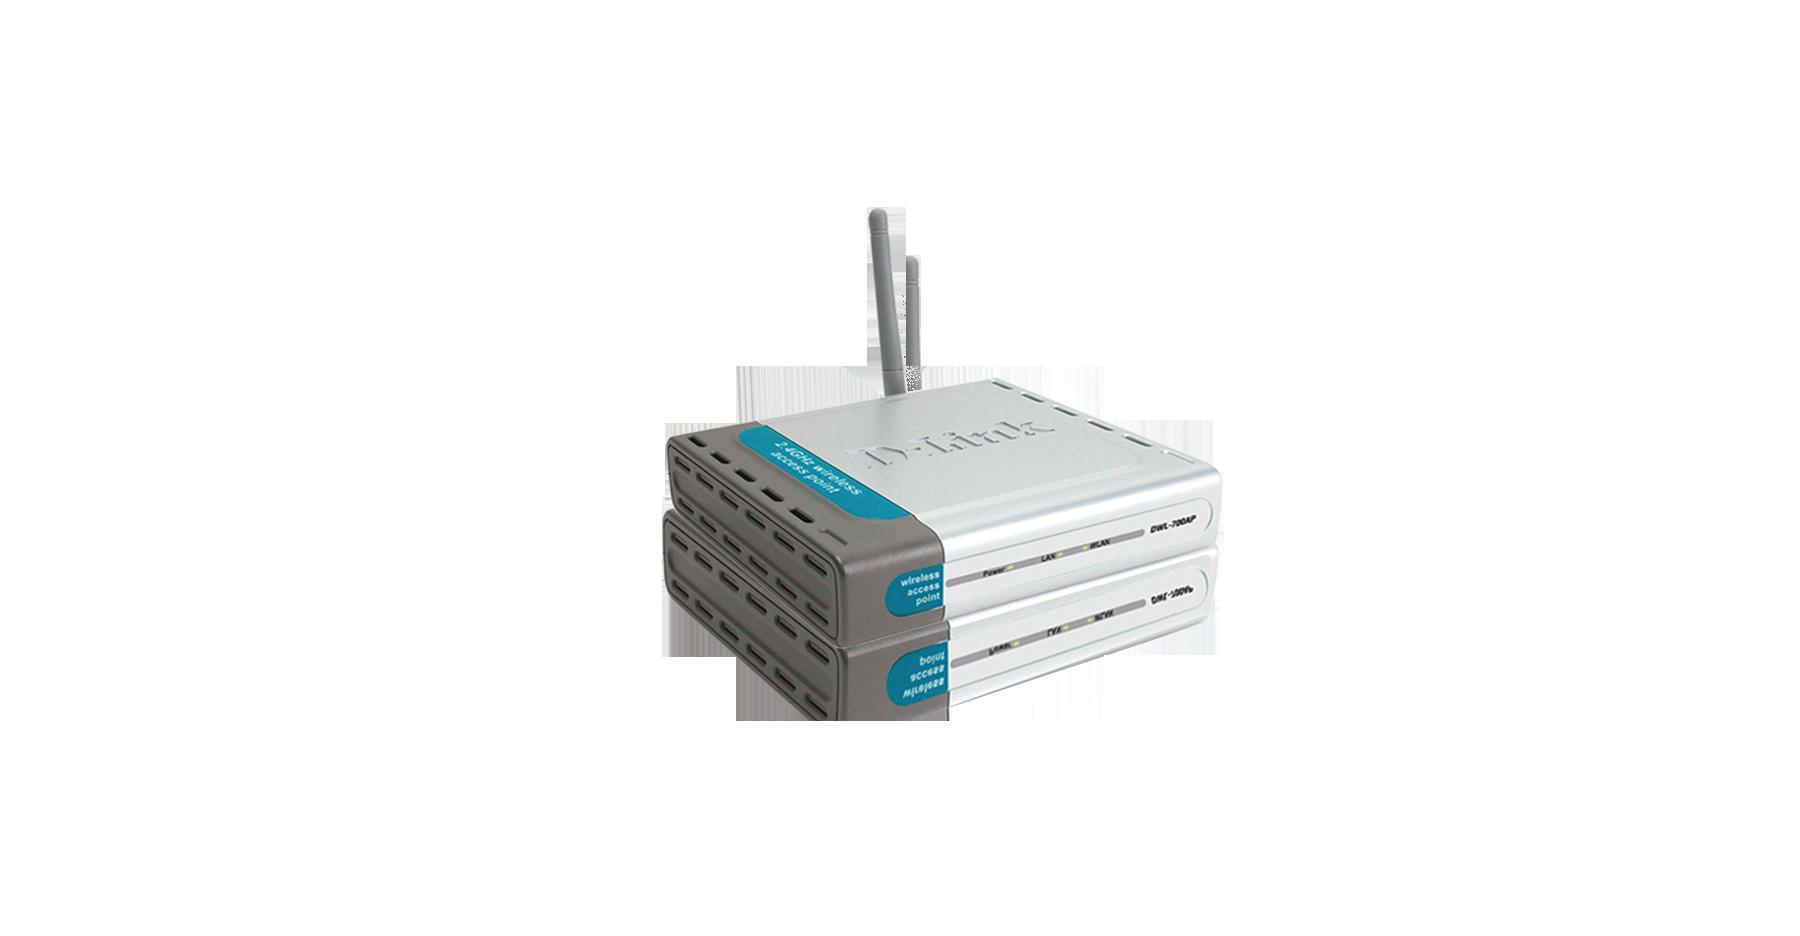 D-Link DWL-520D Driver Download